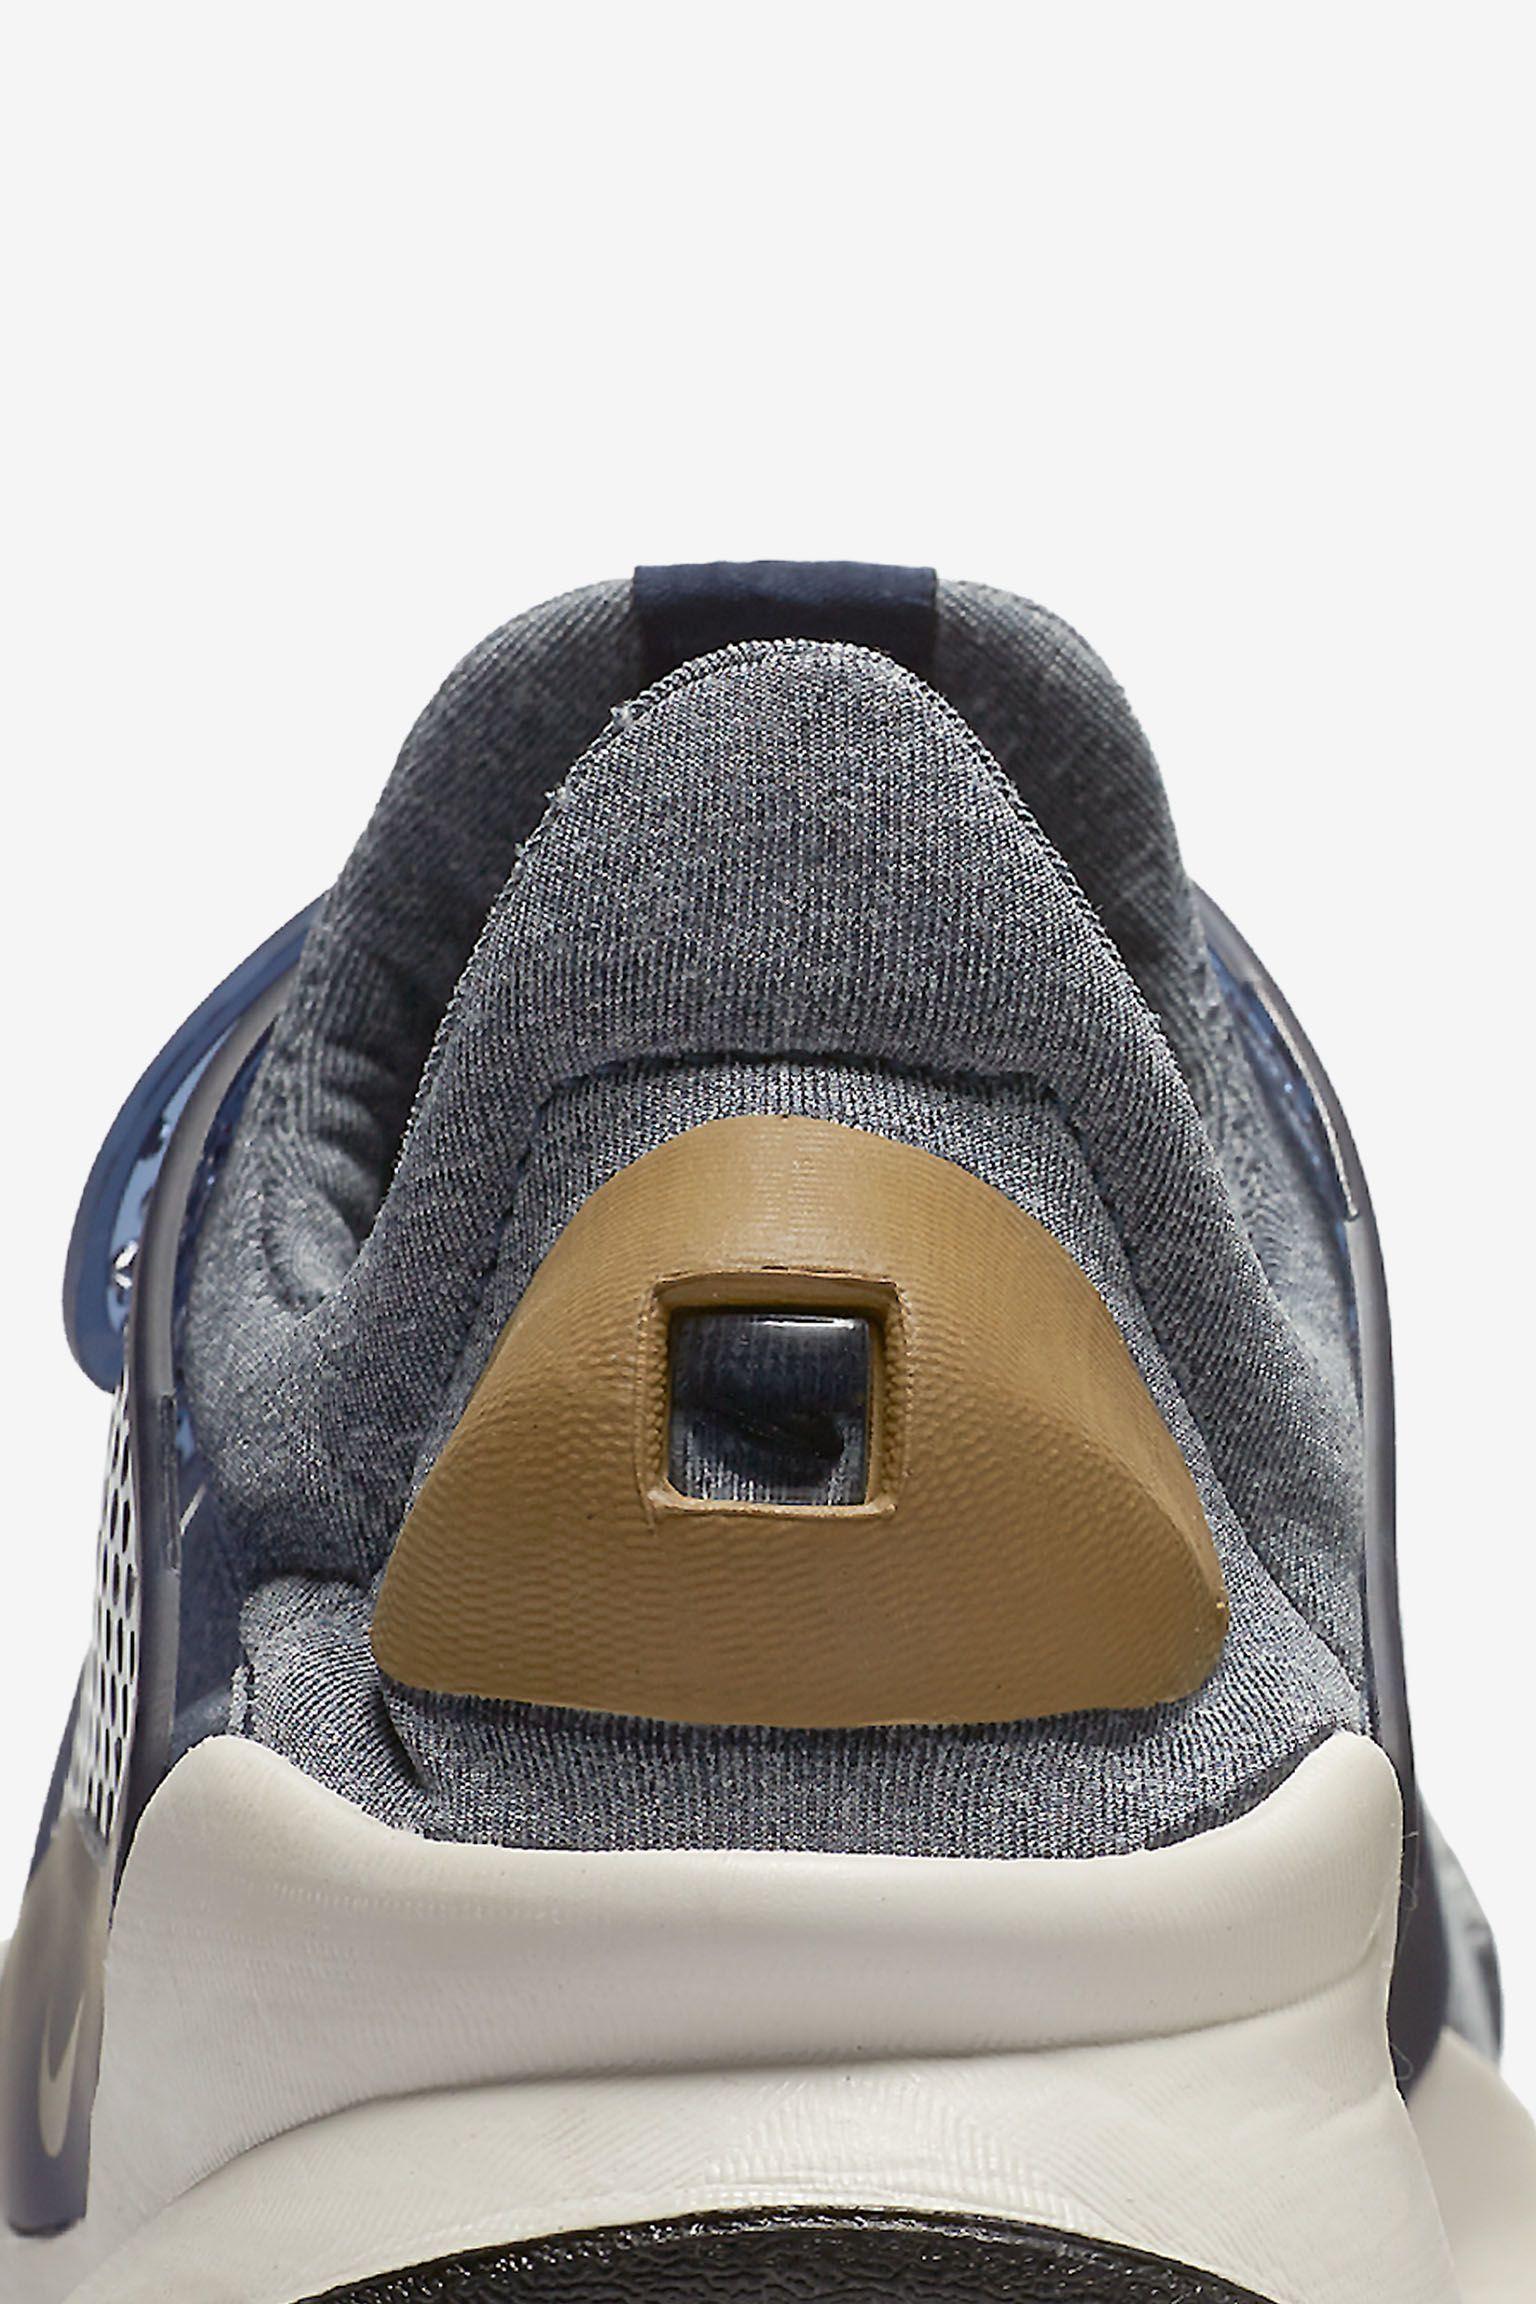 Women's Nike Sock Dart SE 'Midnight Navy & Golden Beige'